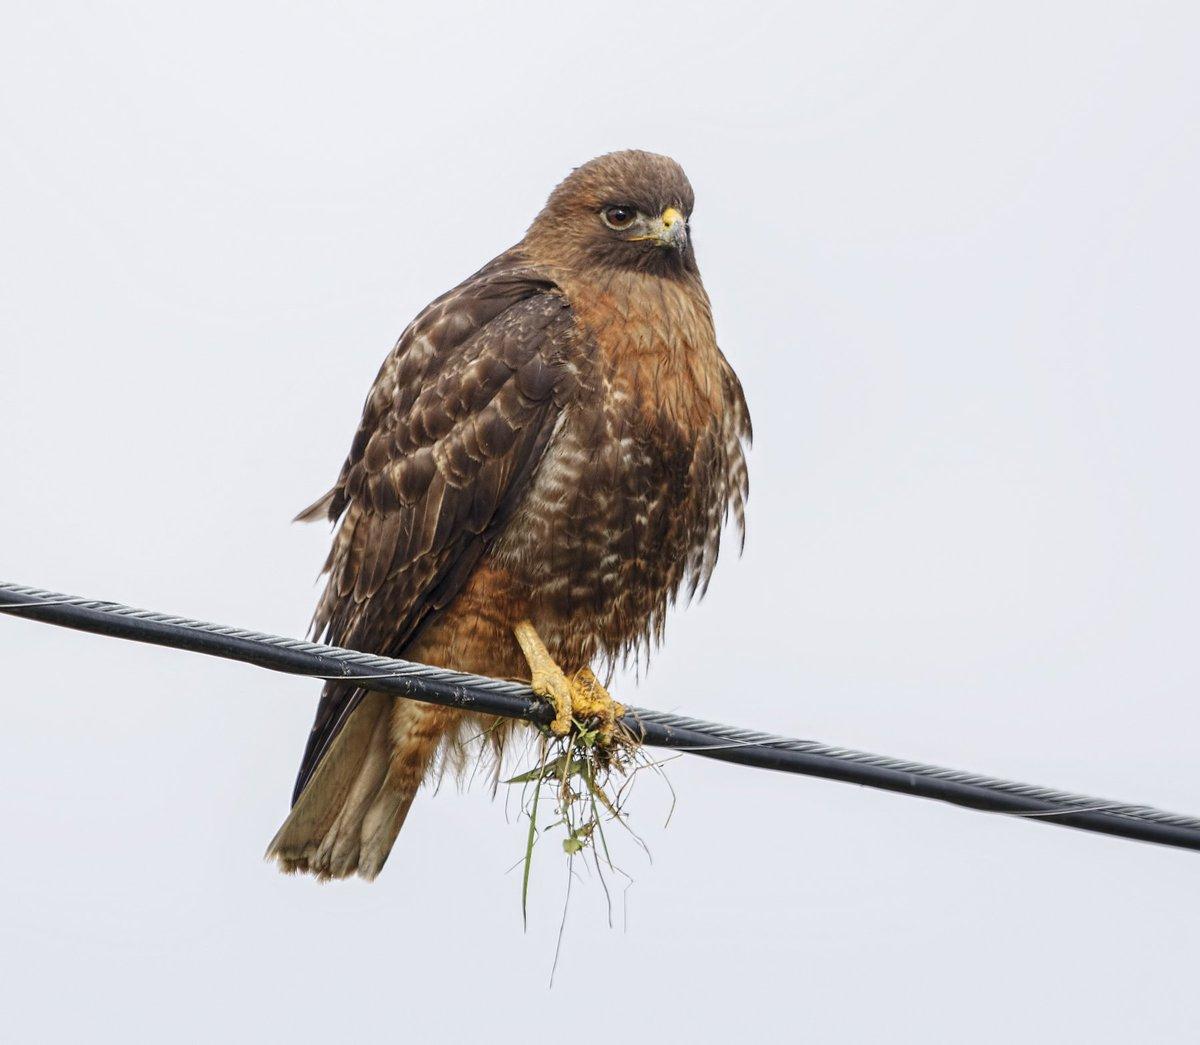 Manhattan Bird Alert On Twitter Harlan S Red Tailed Hawk Washington State Birdcp Birdingbobnyc Https T Co Bgpb1is44v